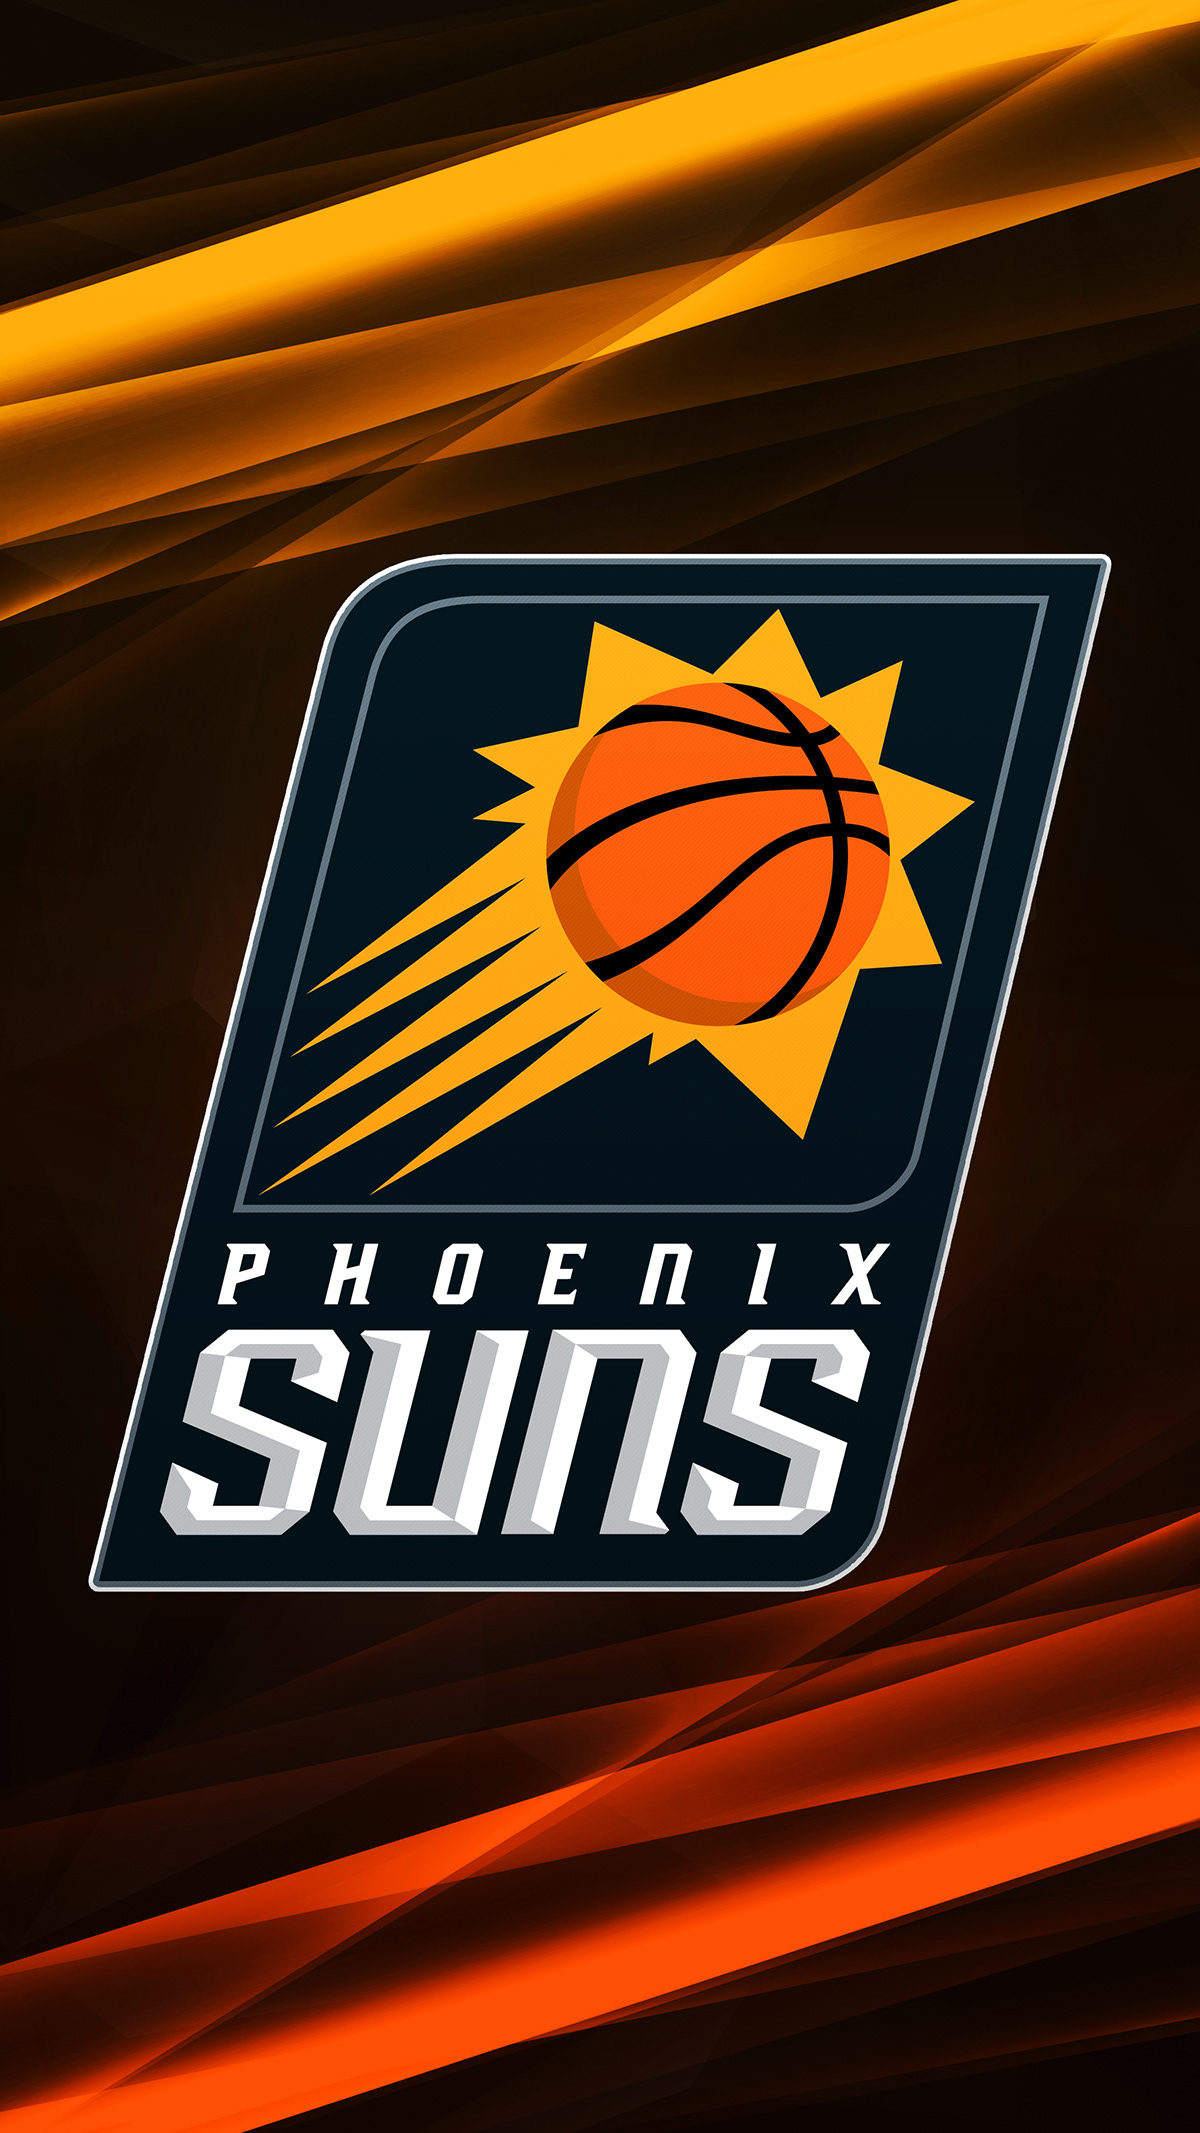 NBA Logo Phone Wallpapers on Behance